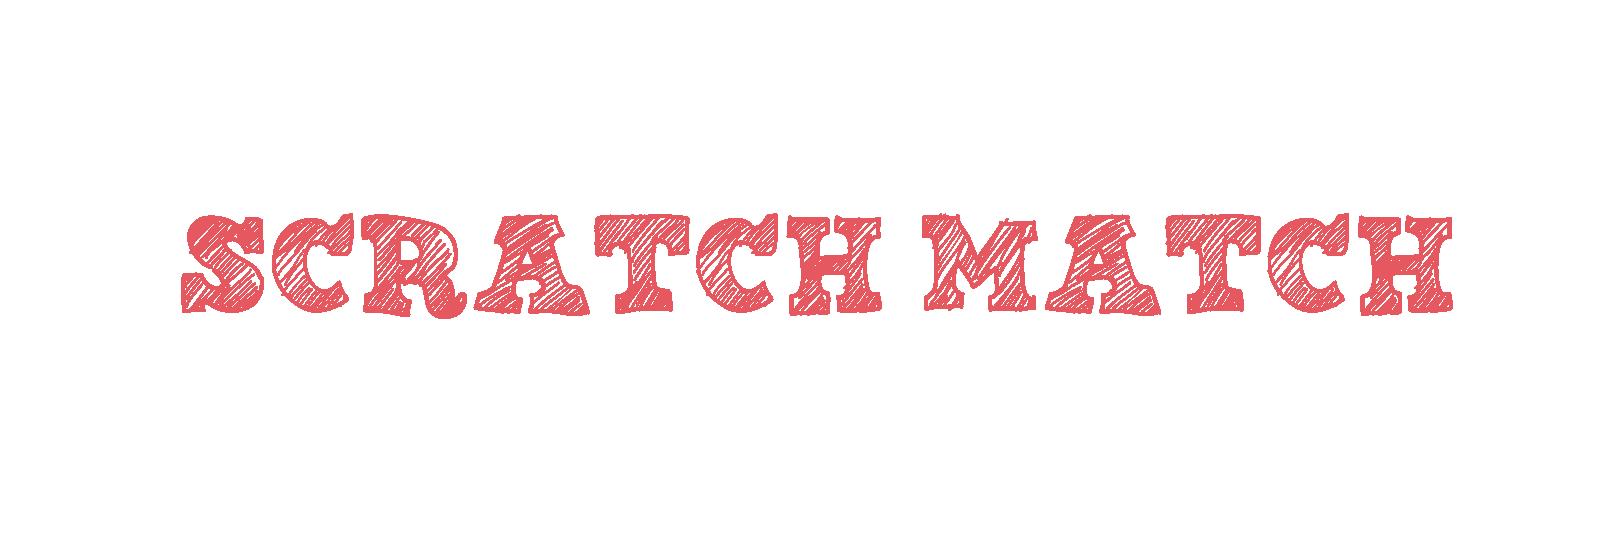 http://admin.ajtyvit.sk/data/media/blog_images/5525a32e53c51a3c7d50dd4d706187d7_scratchmatch_logo_SK.png